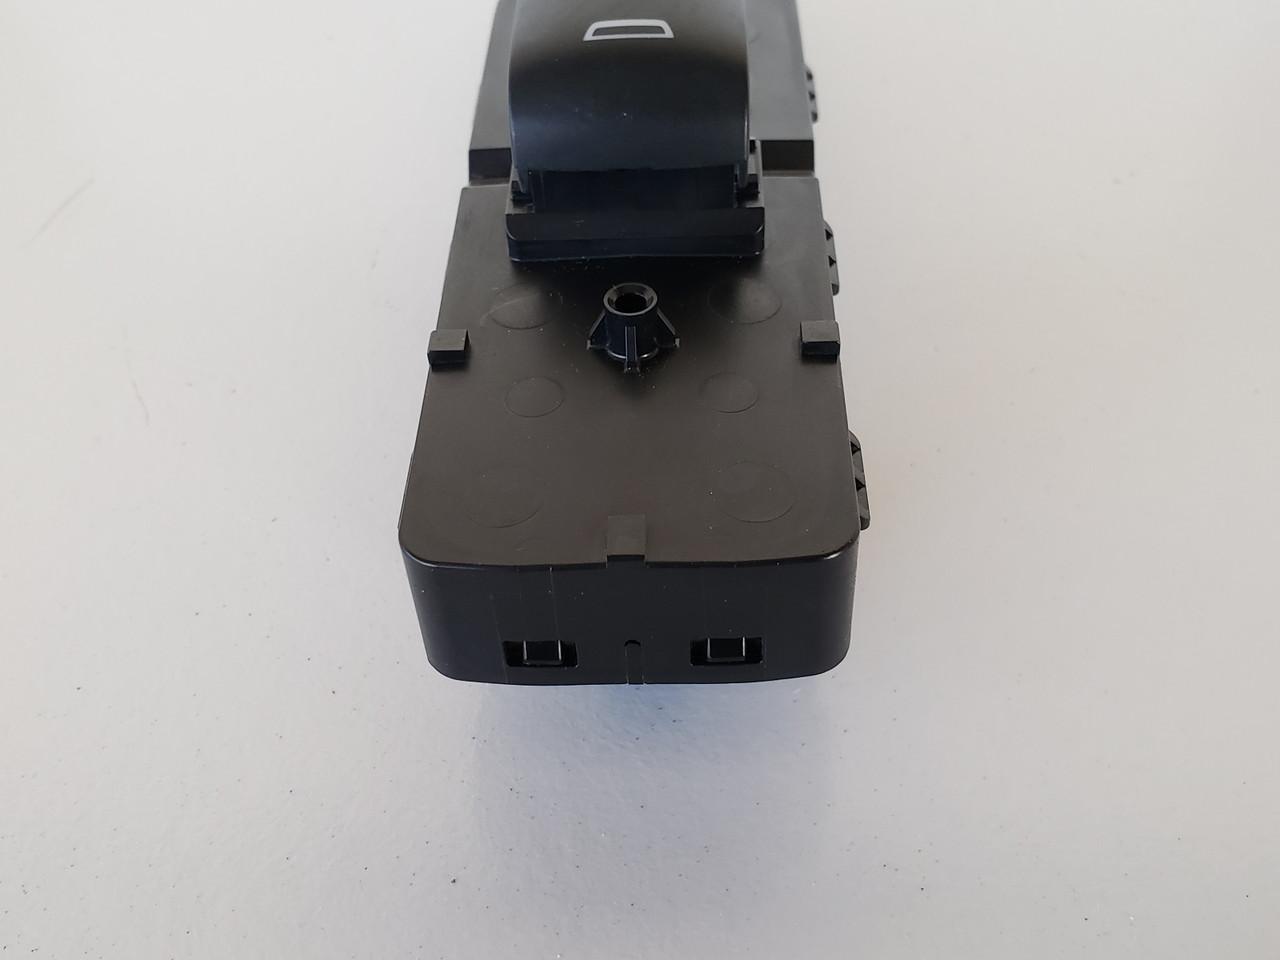 16-19 Chevy Malibu 26218342 Left / Right Rear Passenger Window Switch OEM